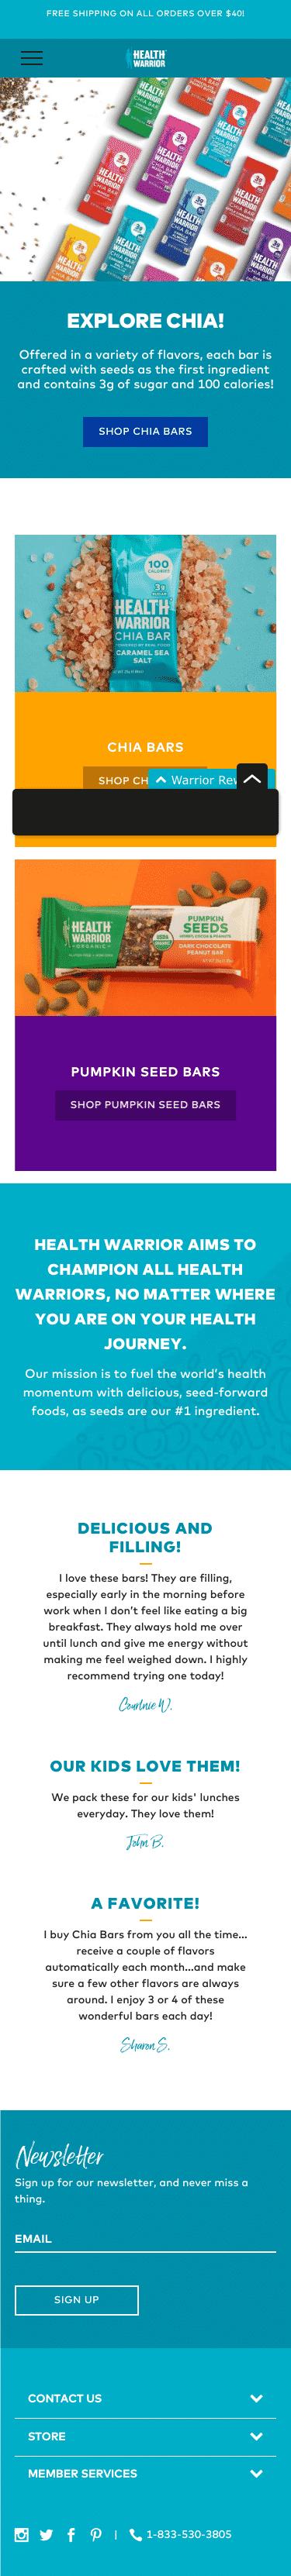 Health Warrior Coupon